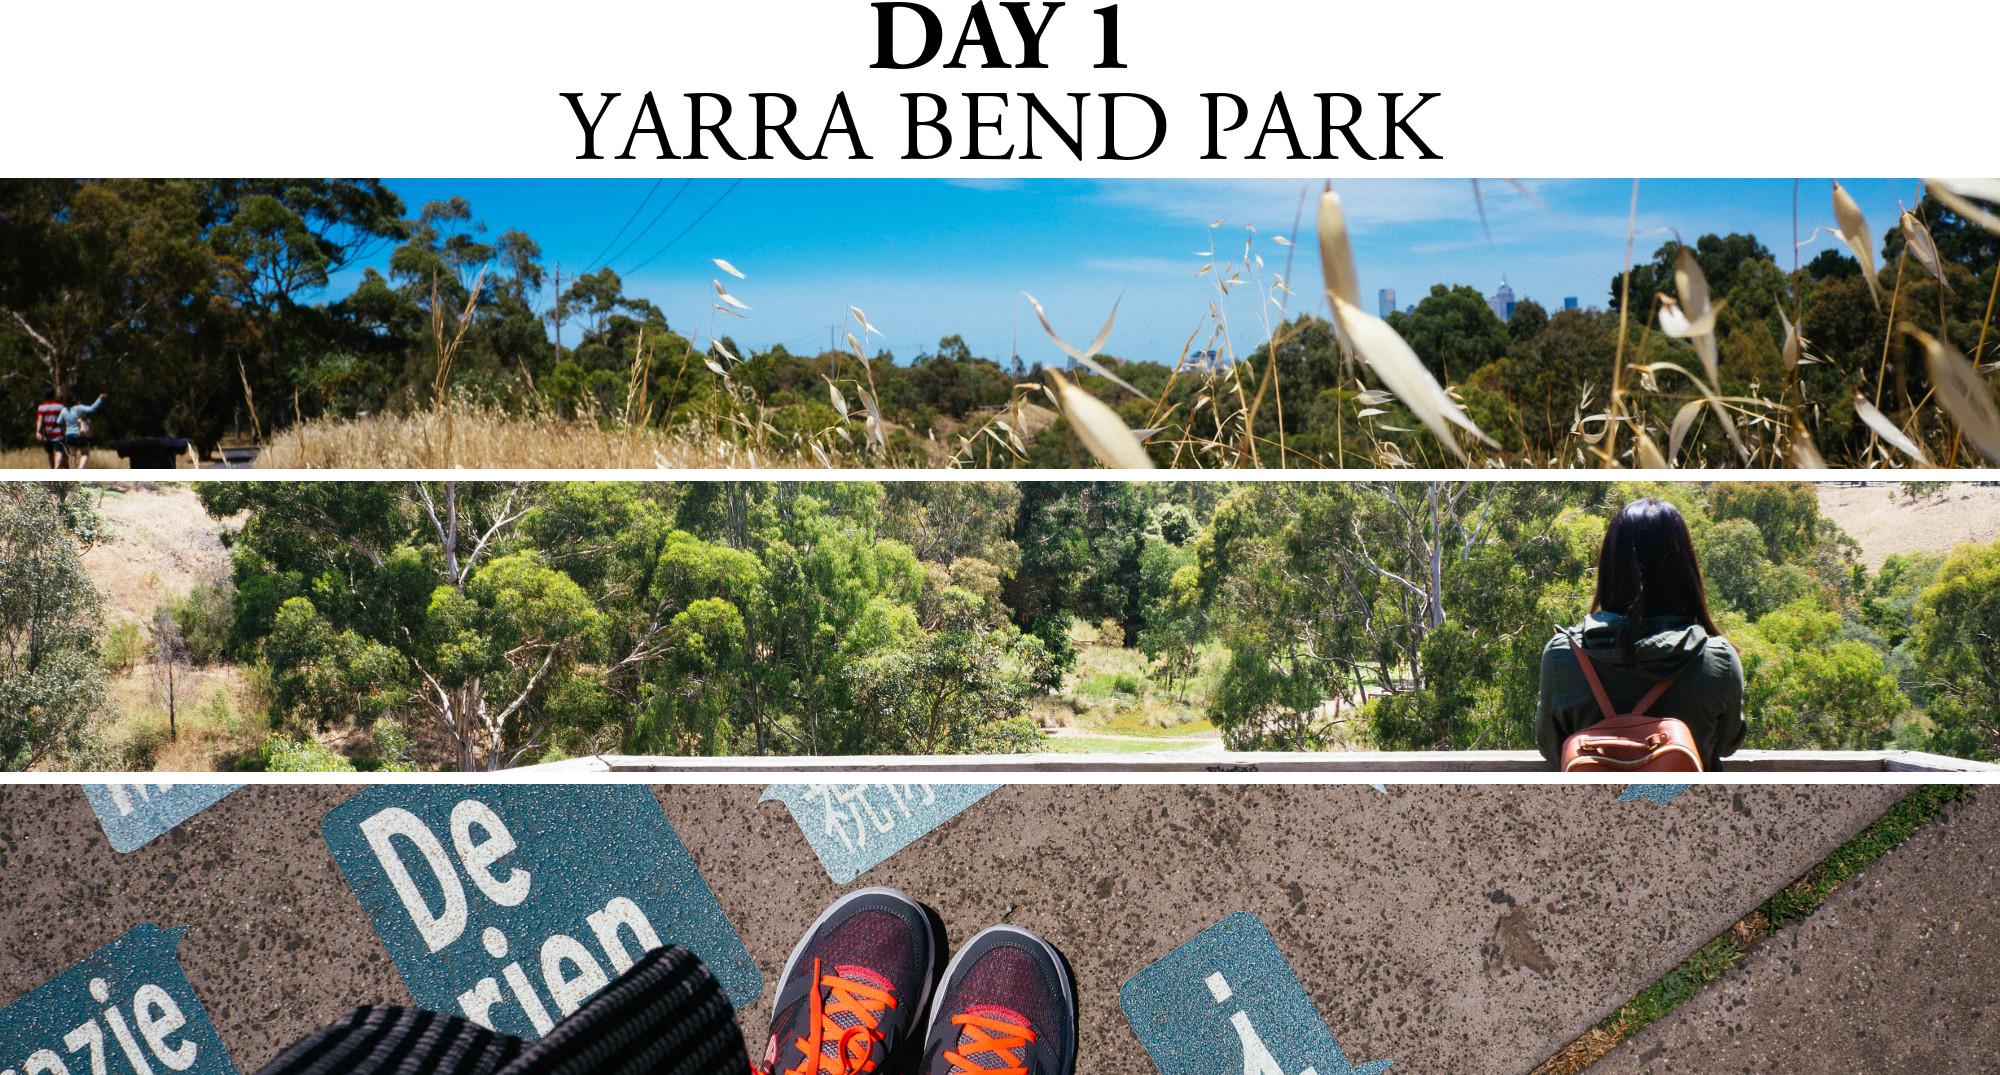 Yarra Bend Park Melbourne Australia City Guide